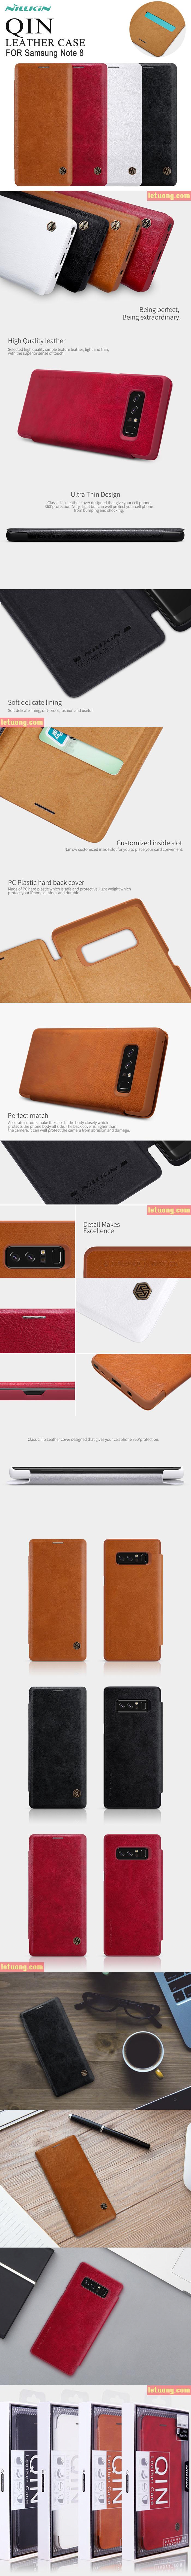 Bao da Galaxy Note 8 Nillkin Qin Leather Case sang trọng, cổ điển 2